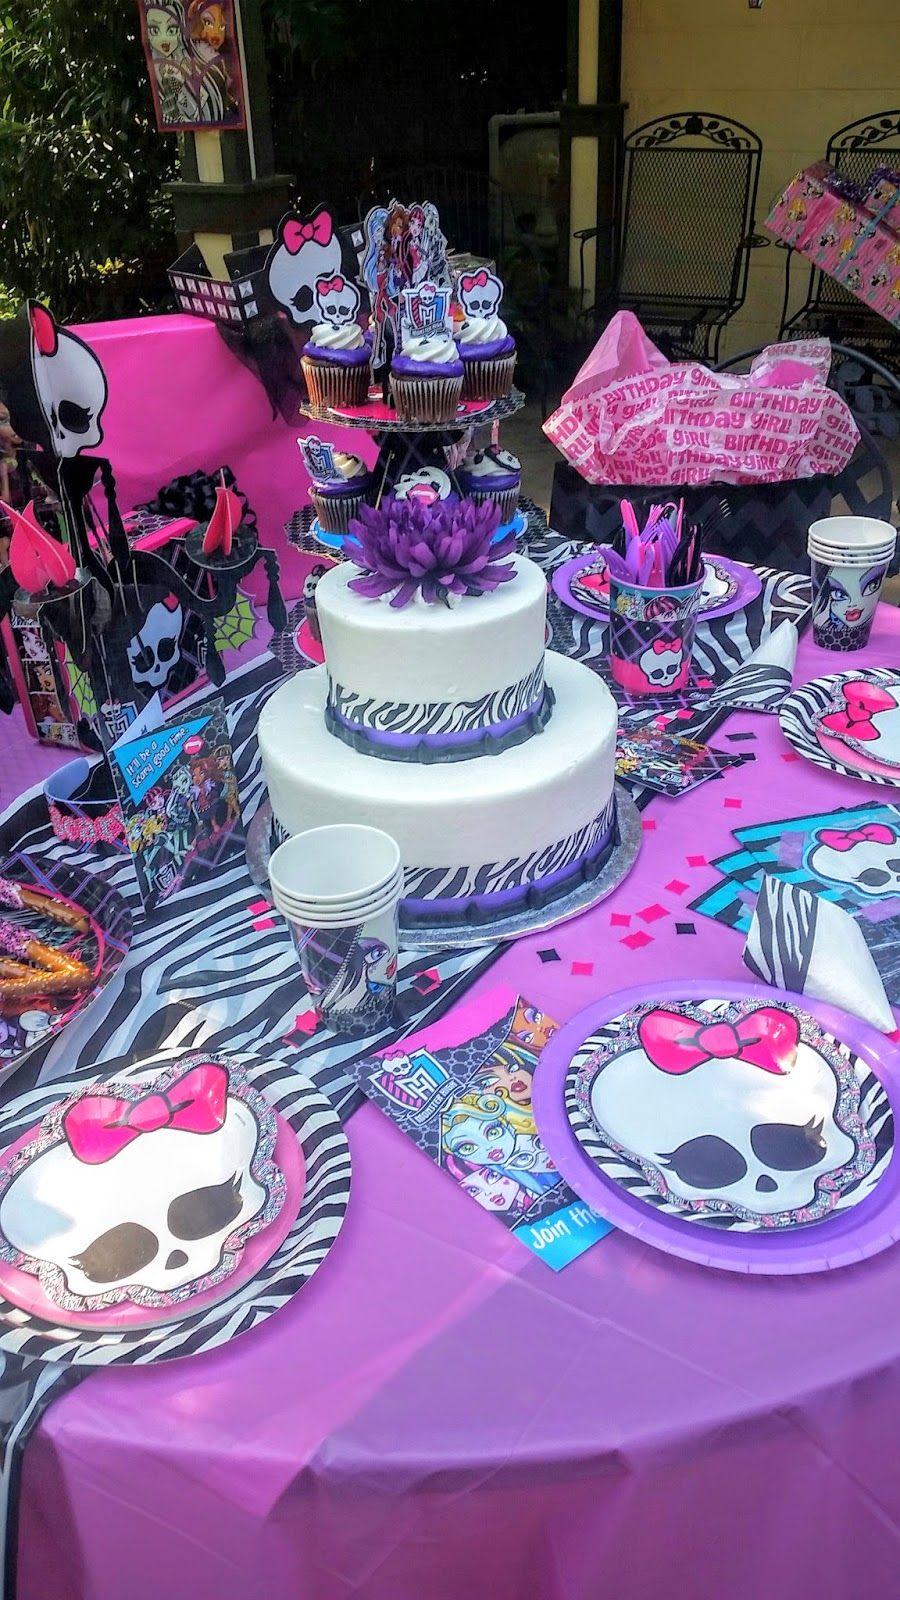 Walmart Cake Designs : walmart, designs, Beautiful, Image, Walmart, Bakery, Cakes, Birthdays, Bi…, Birthday, Cakes,, Cake,